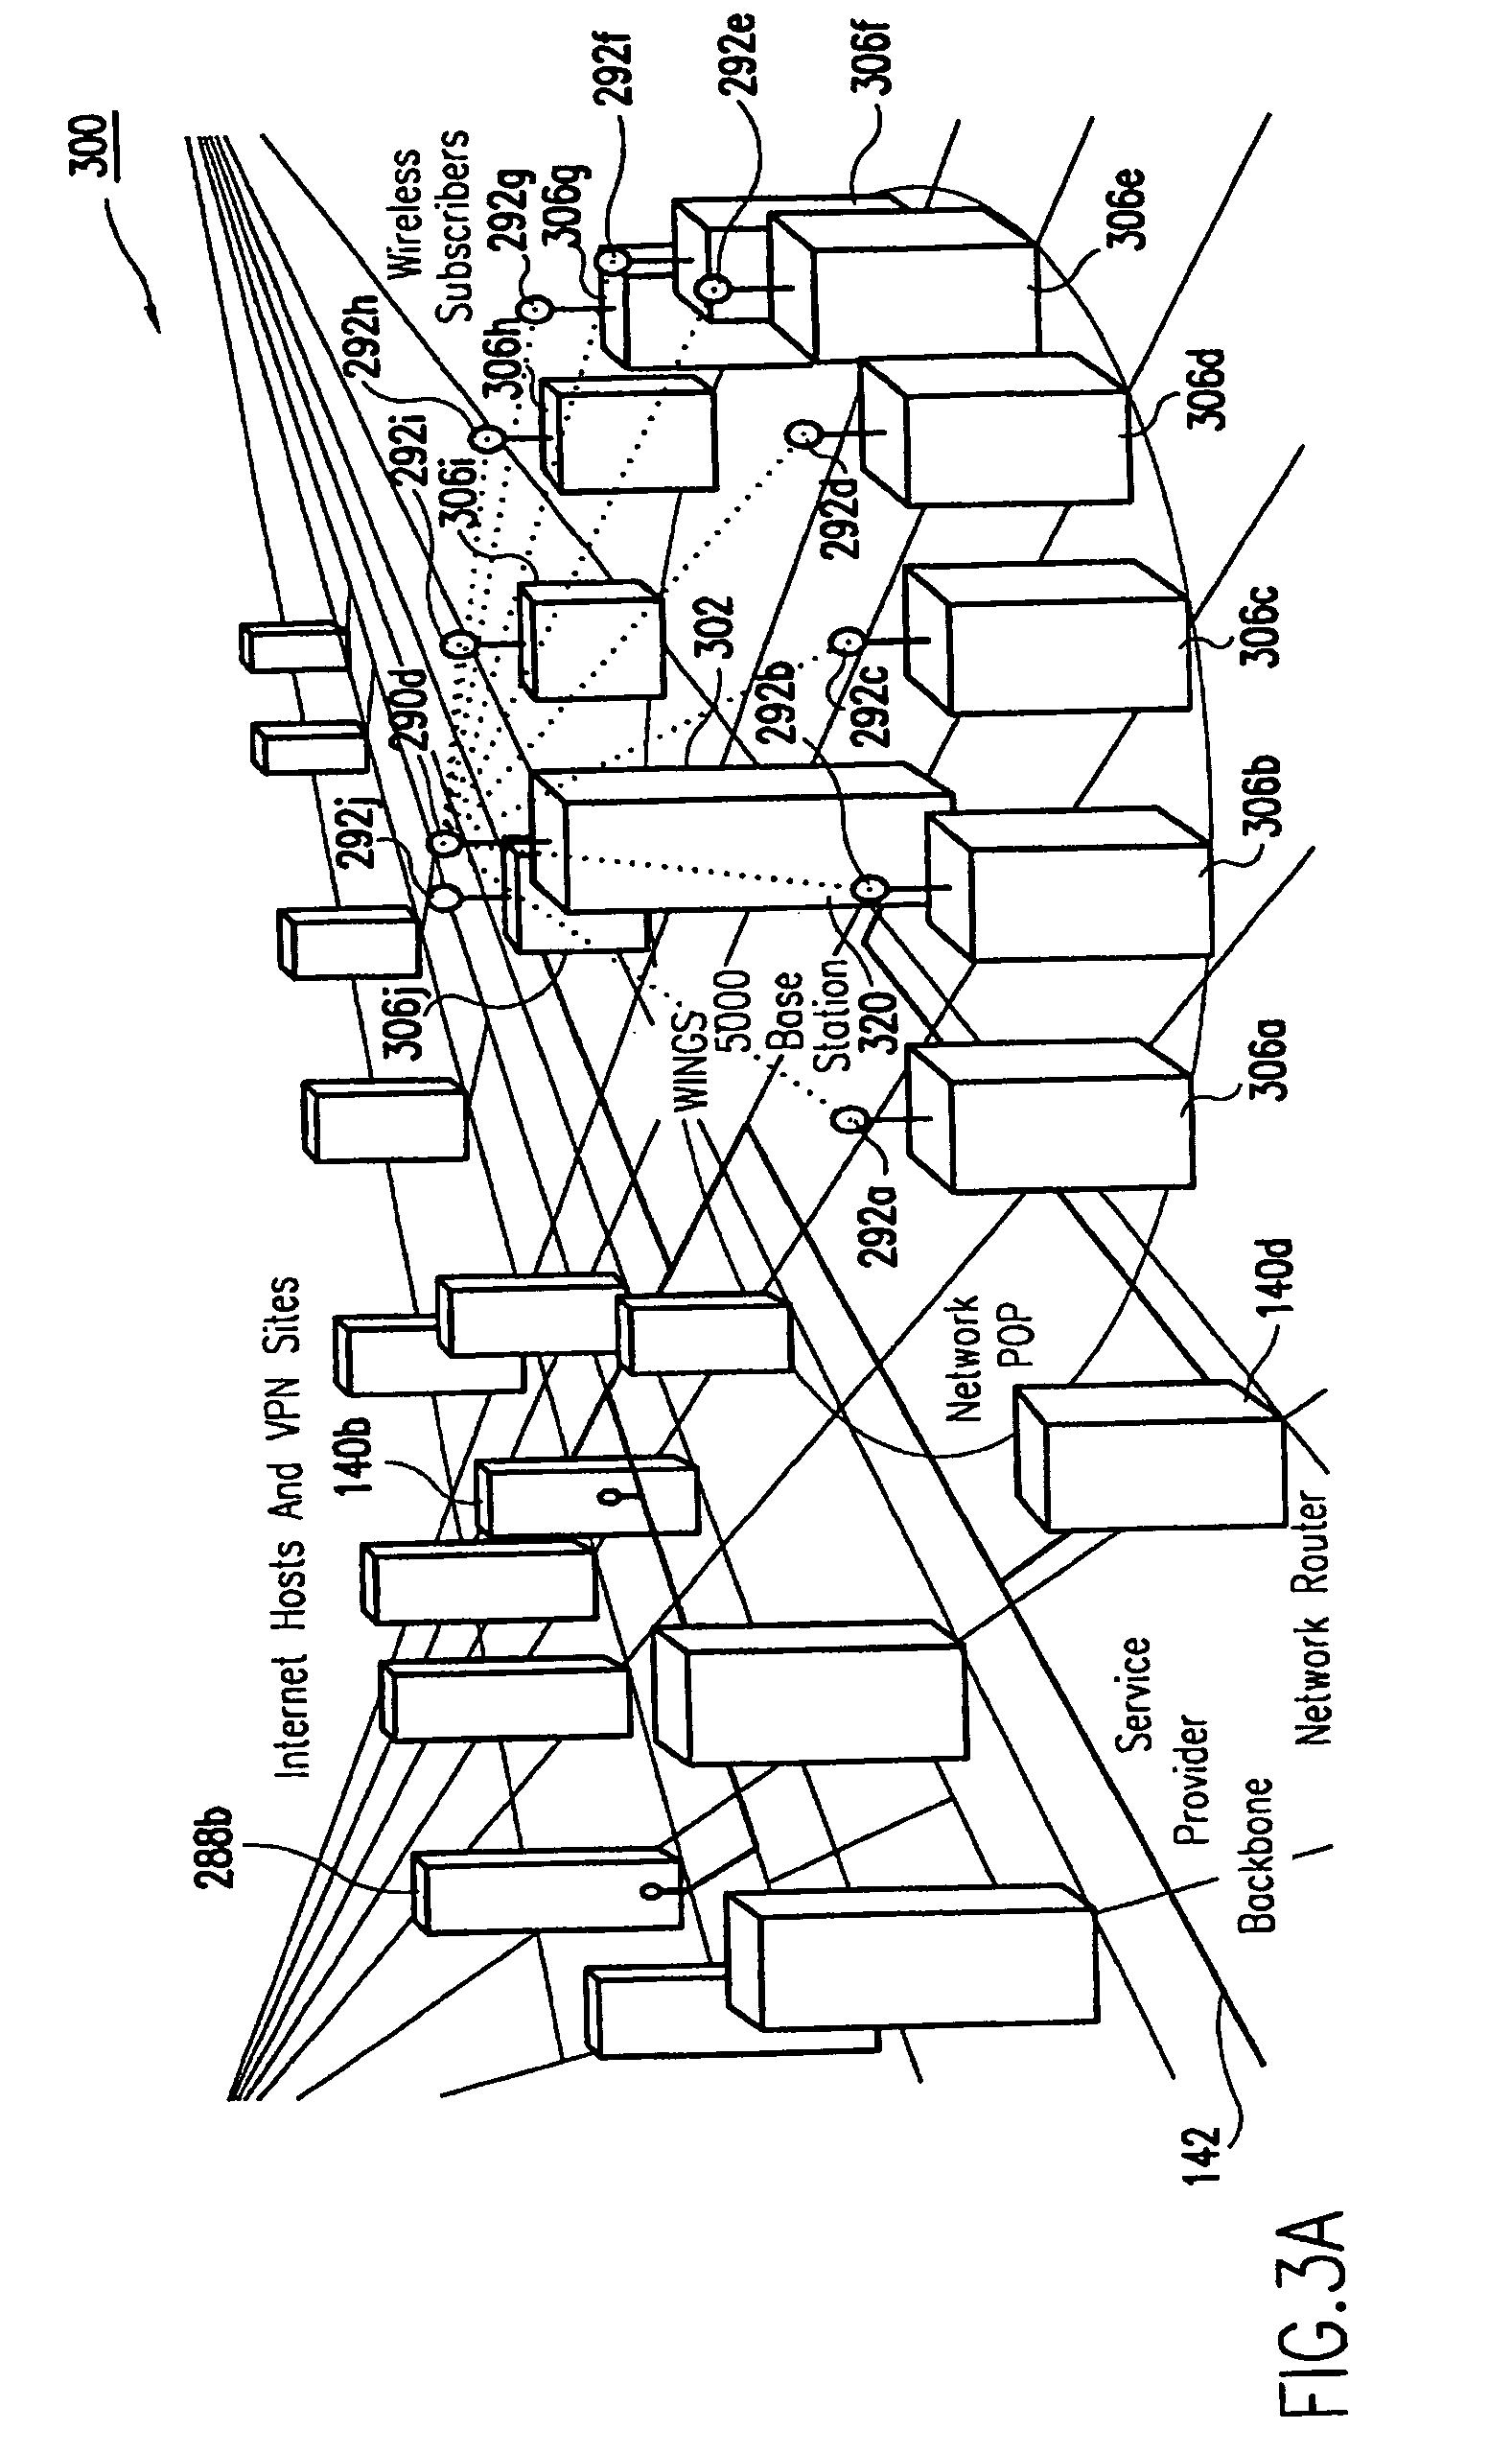 Patent US 7,496,674 B2